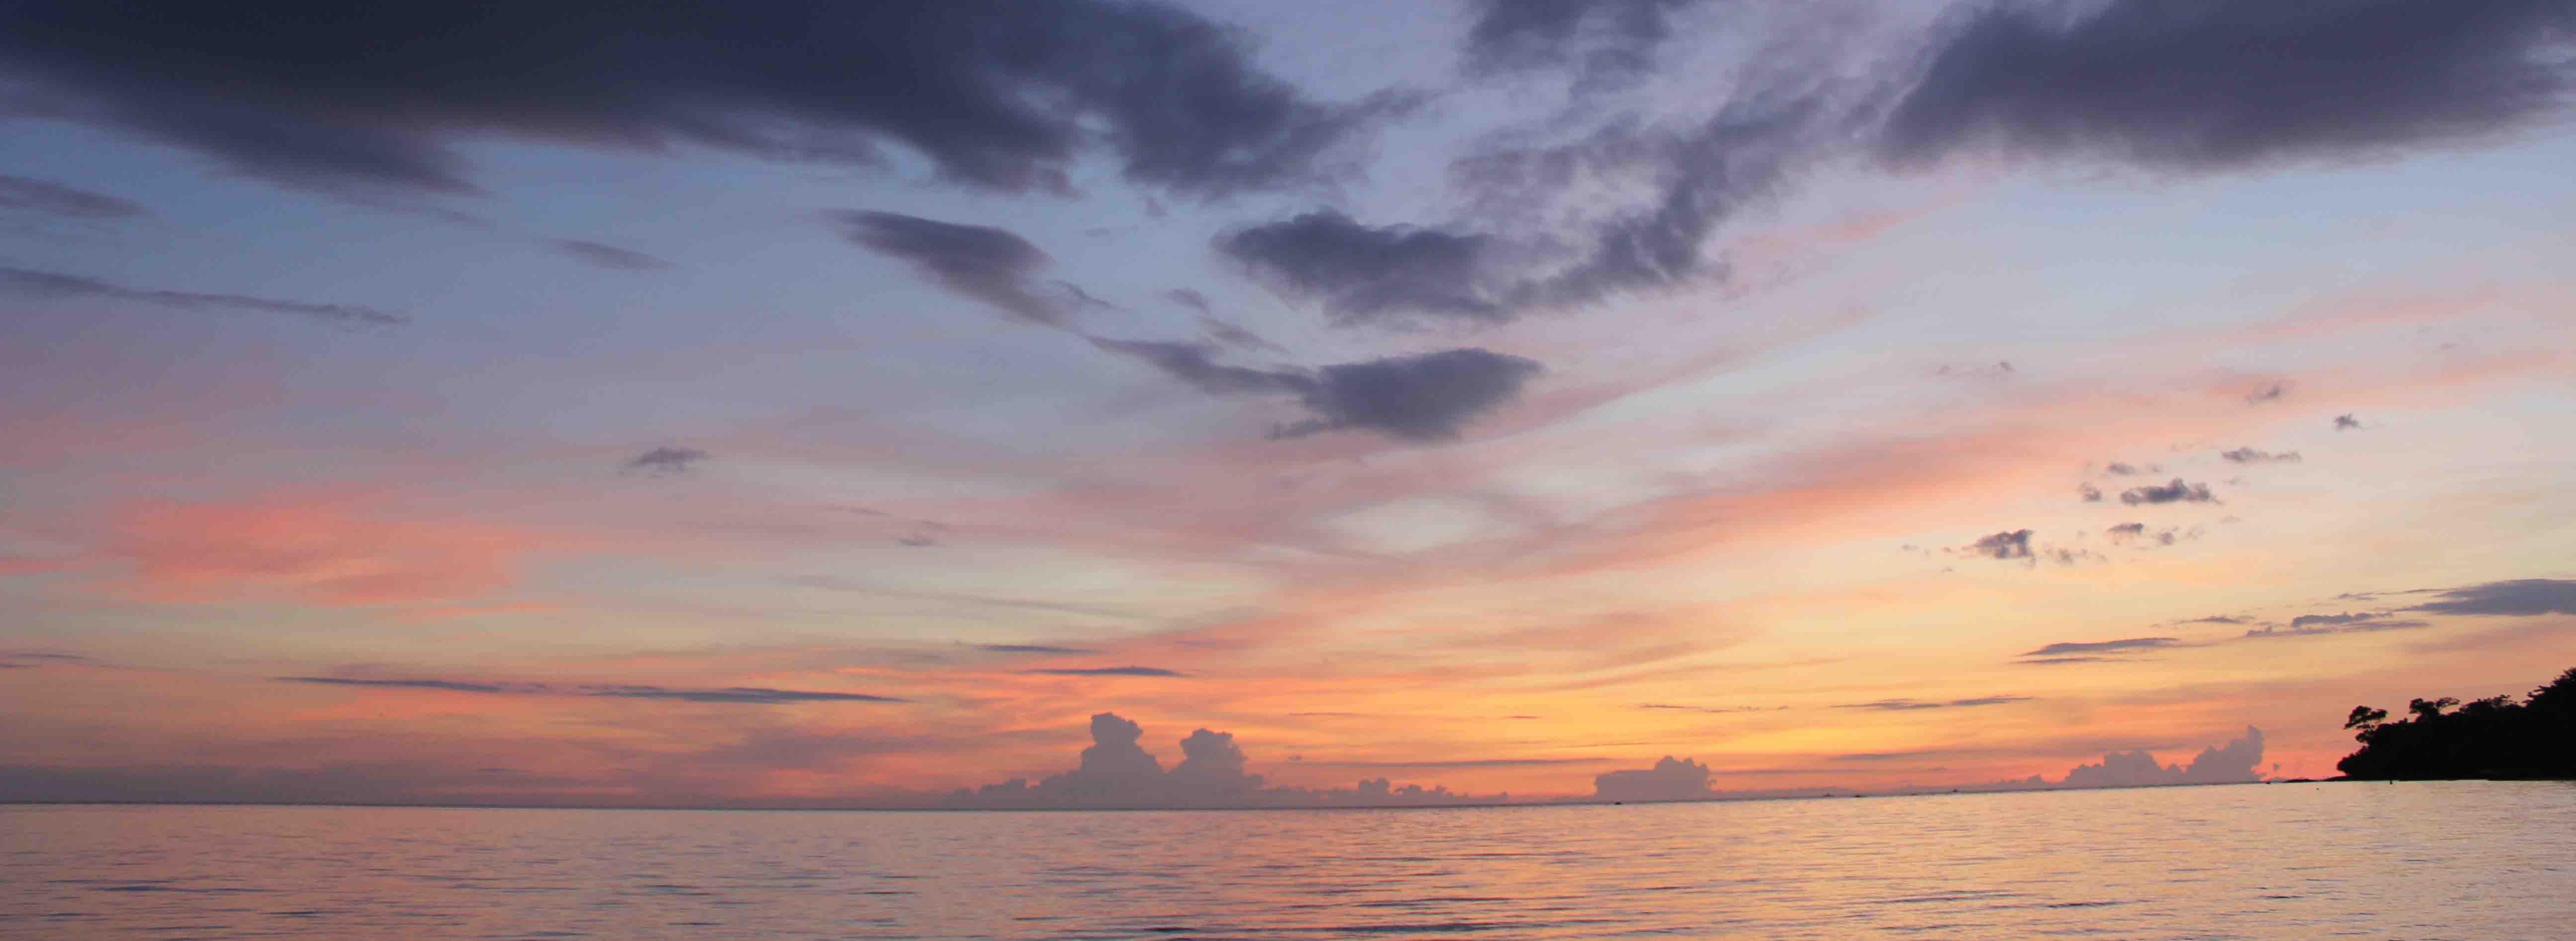 North Pandan Island, Philippines